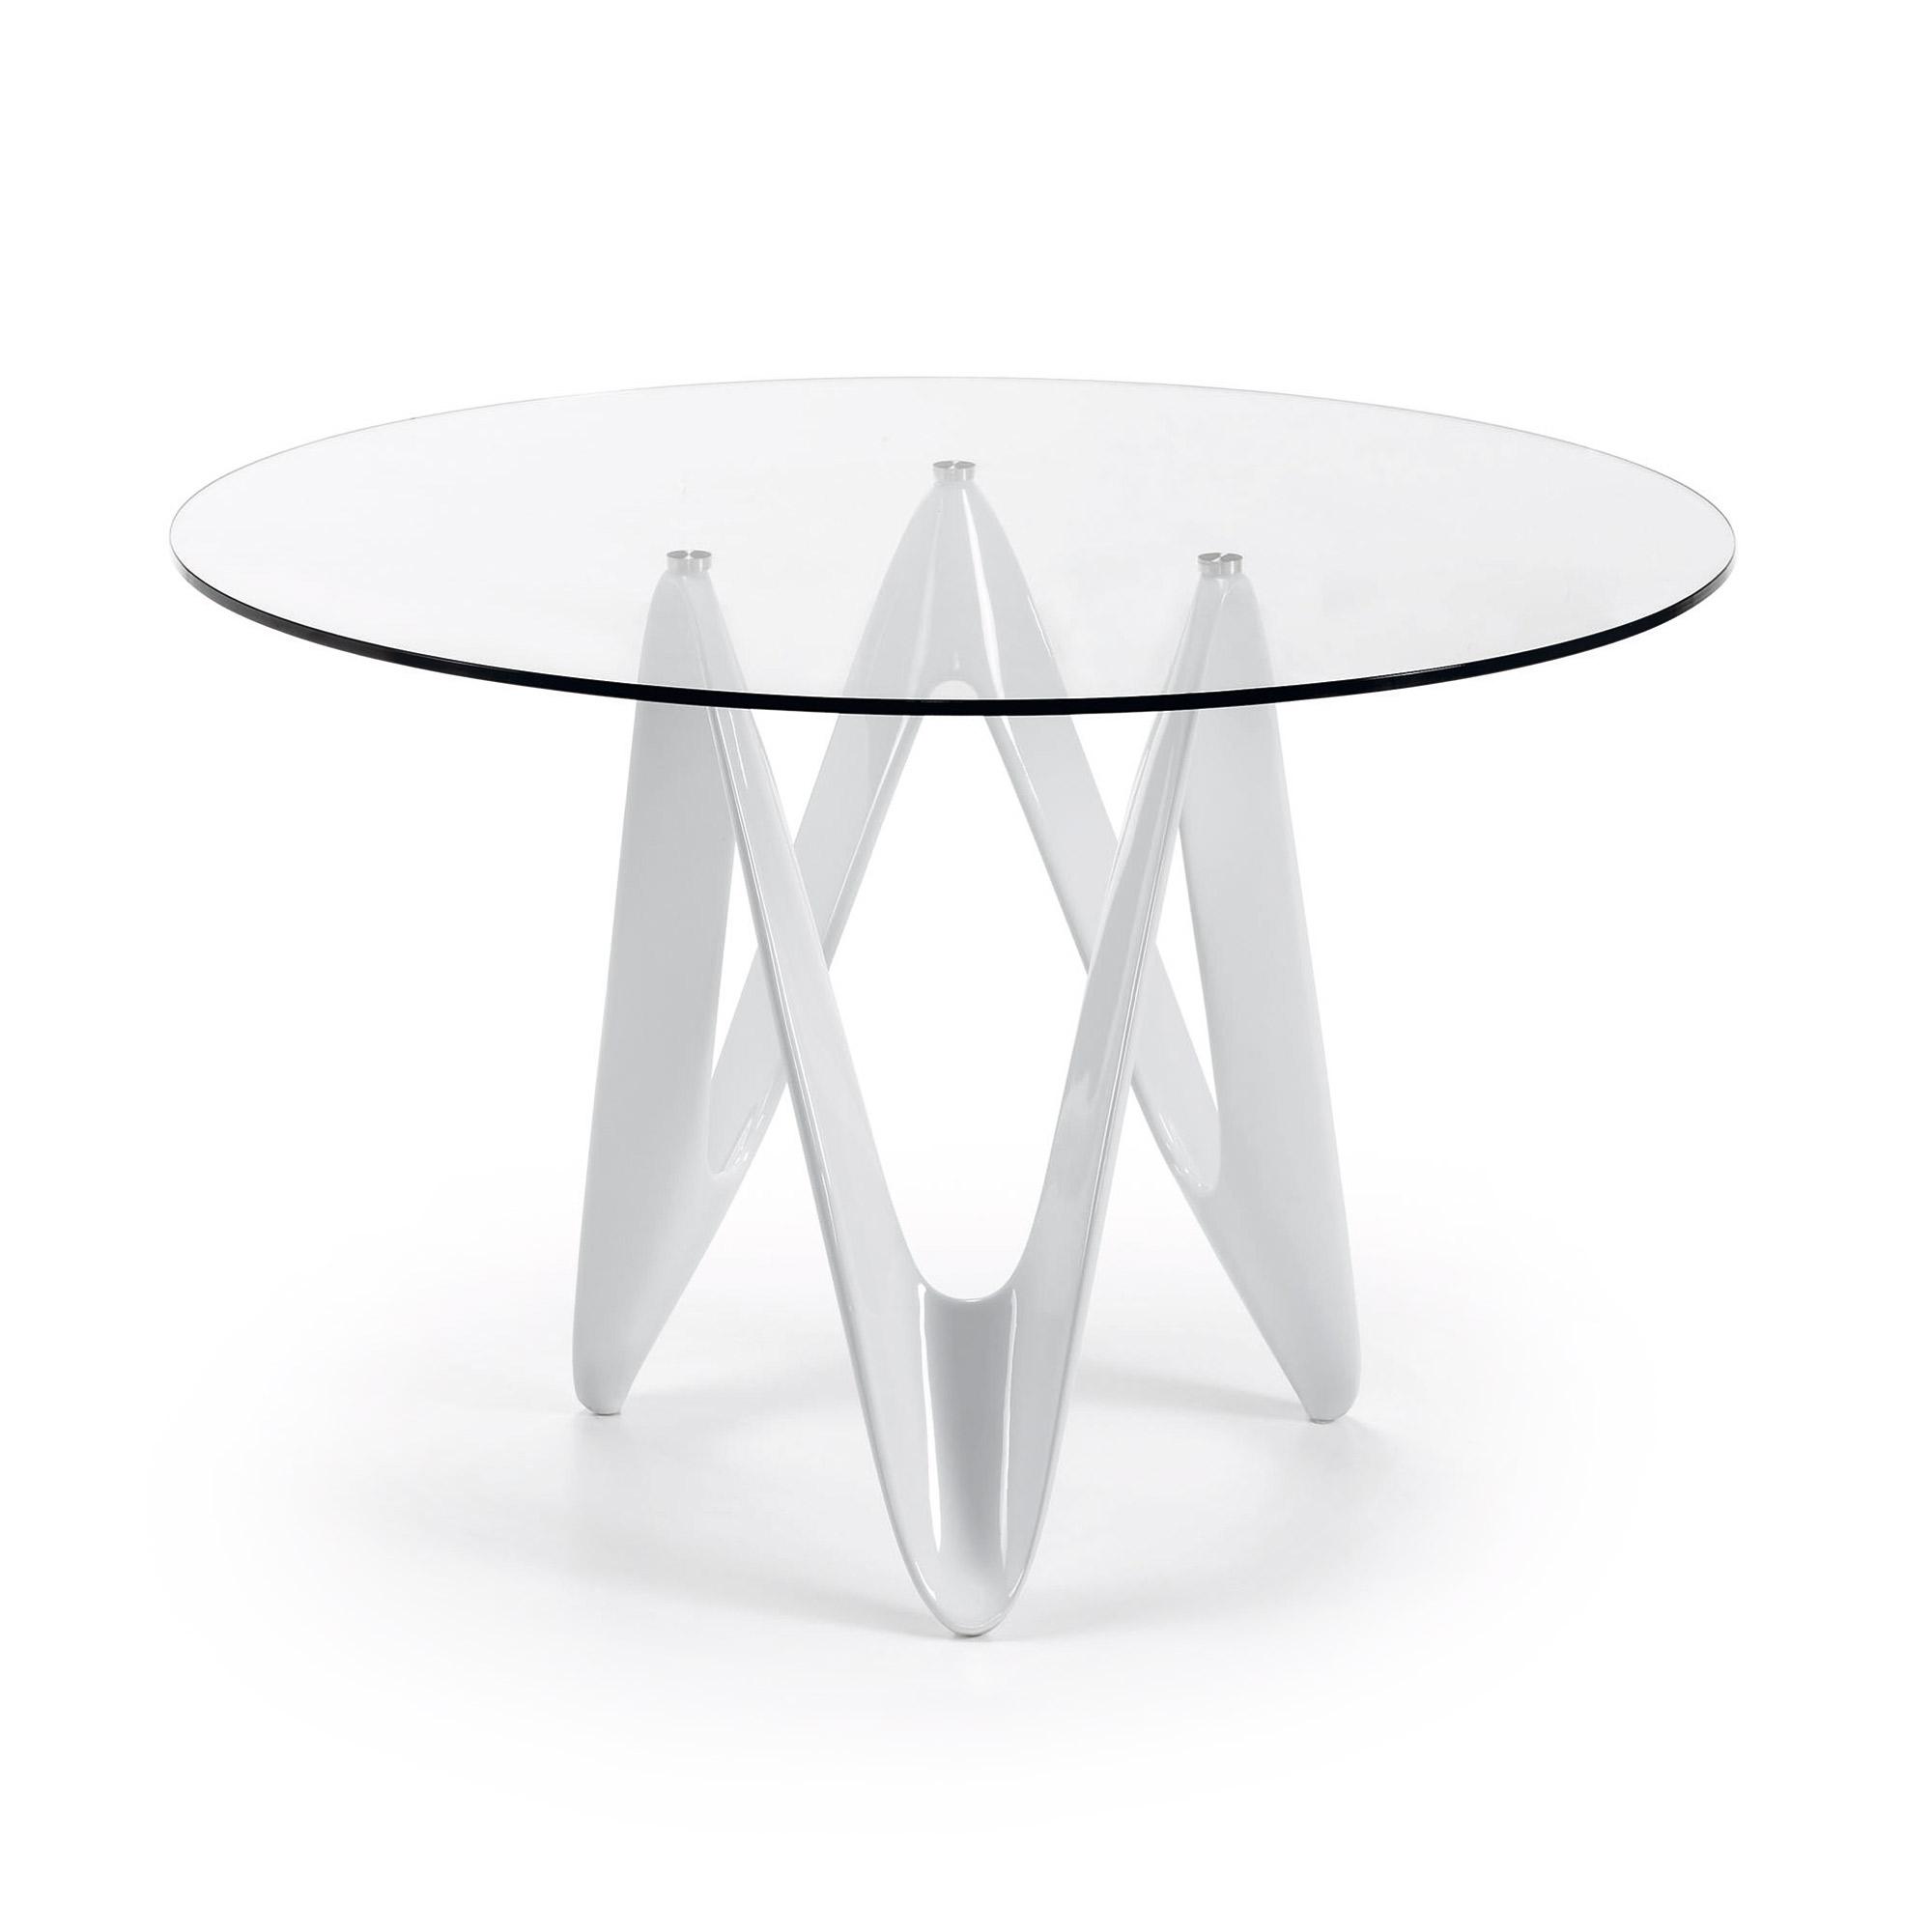 LAFORMA Eos spisebord - klar/hvid glas/glasfiber, rund (Ø120)